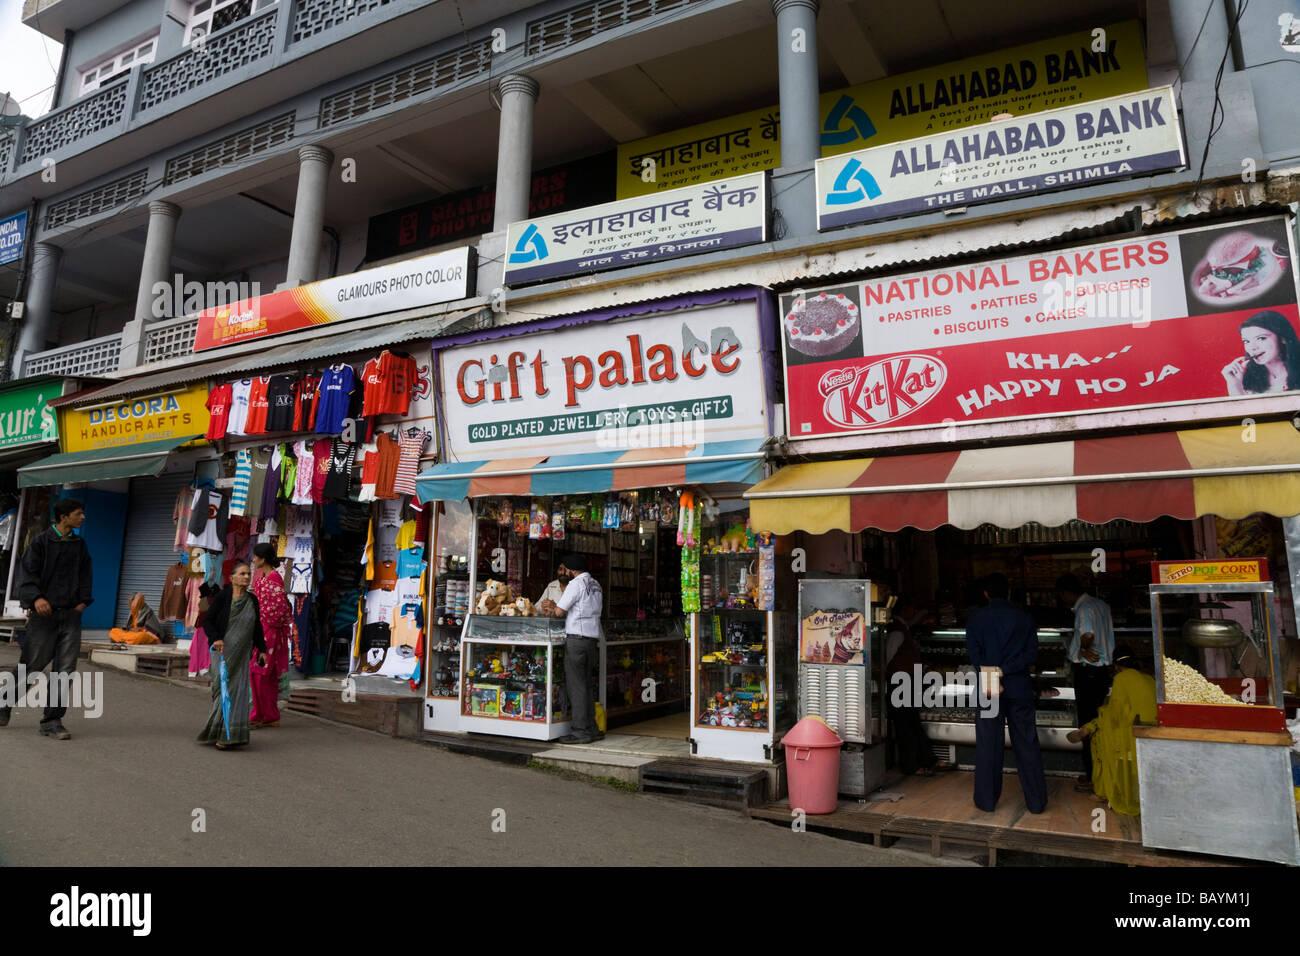 Simla Food Store